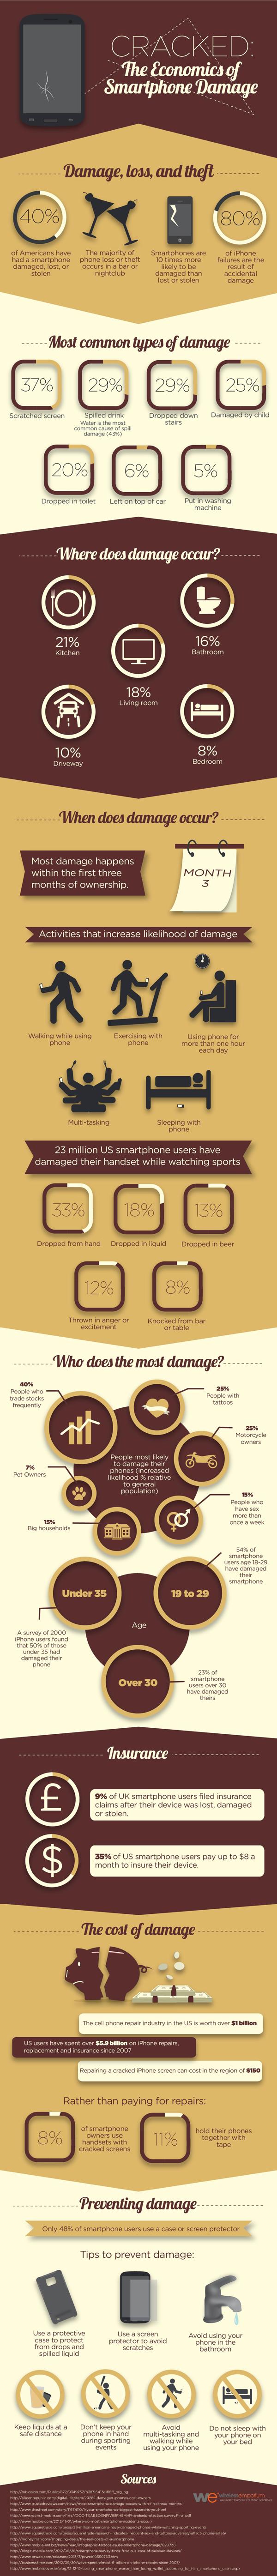 The Economics of Smartphone Damage